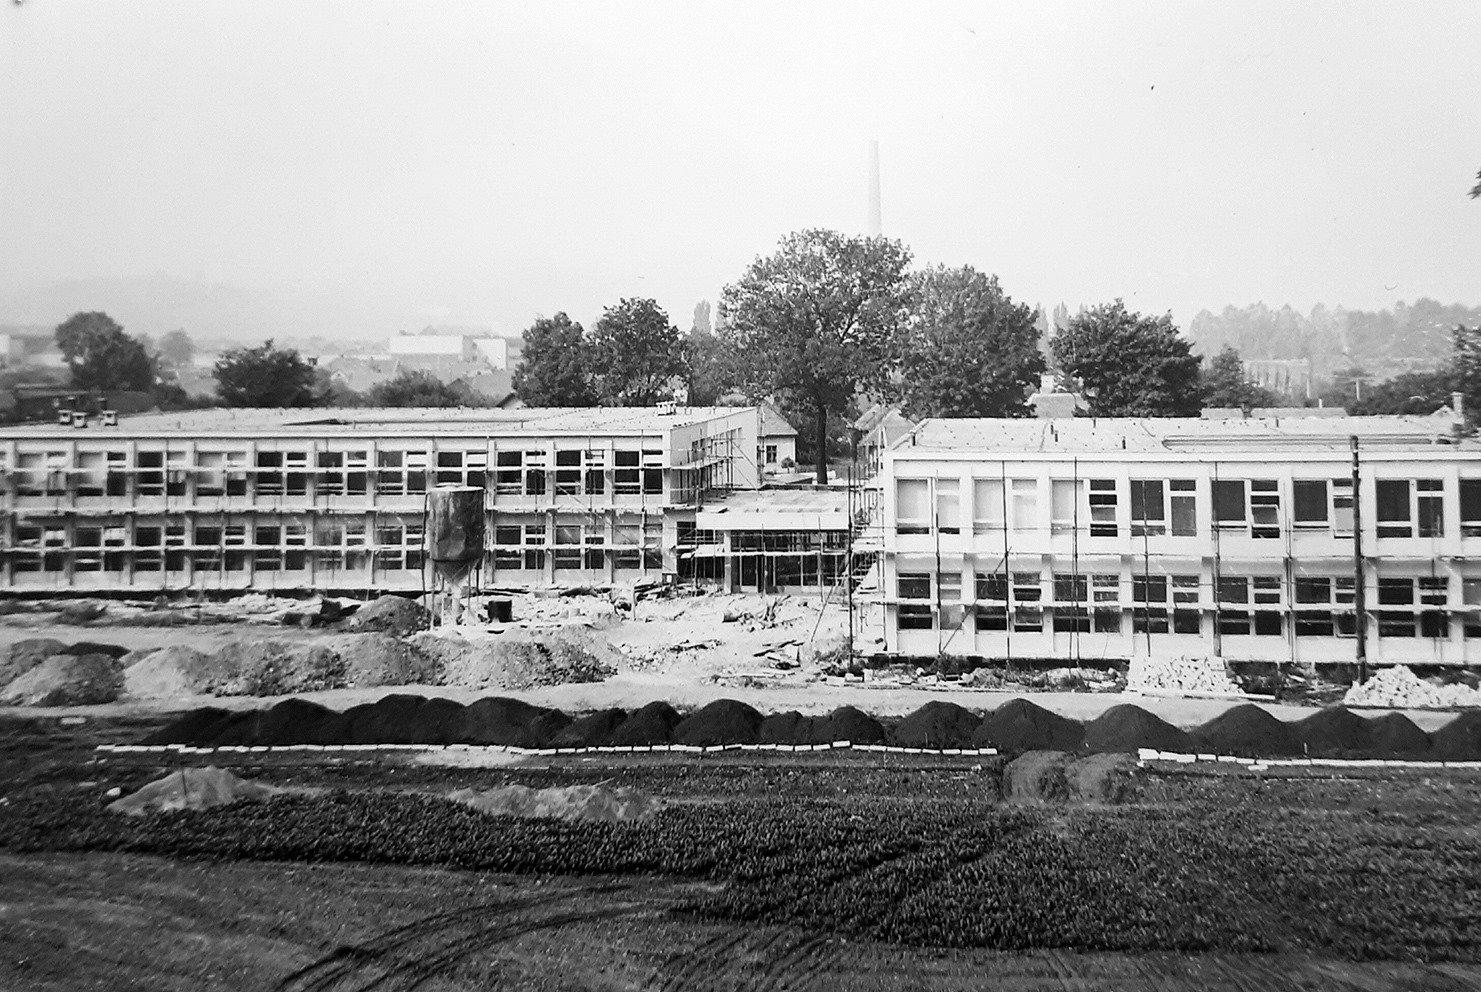 Skola jahodniky, 1975 - 1976